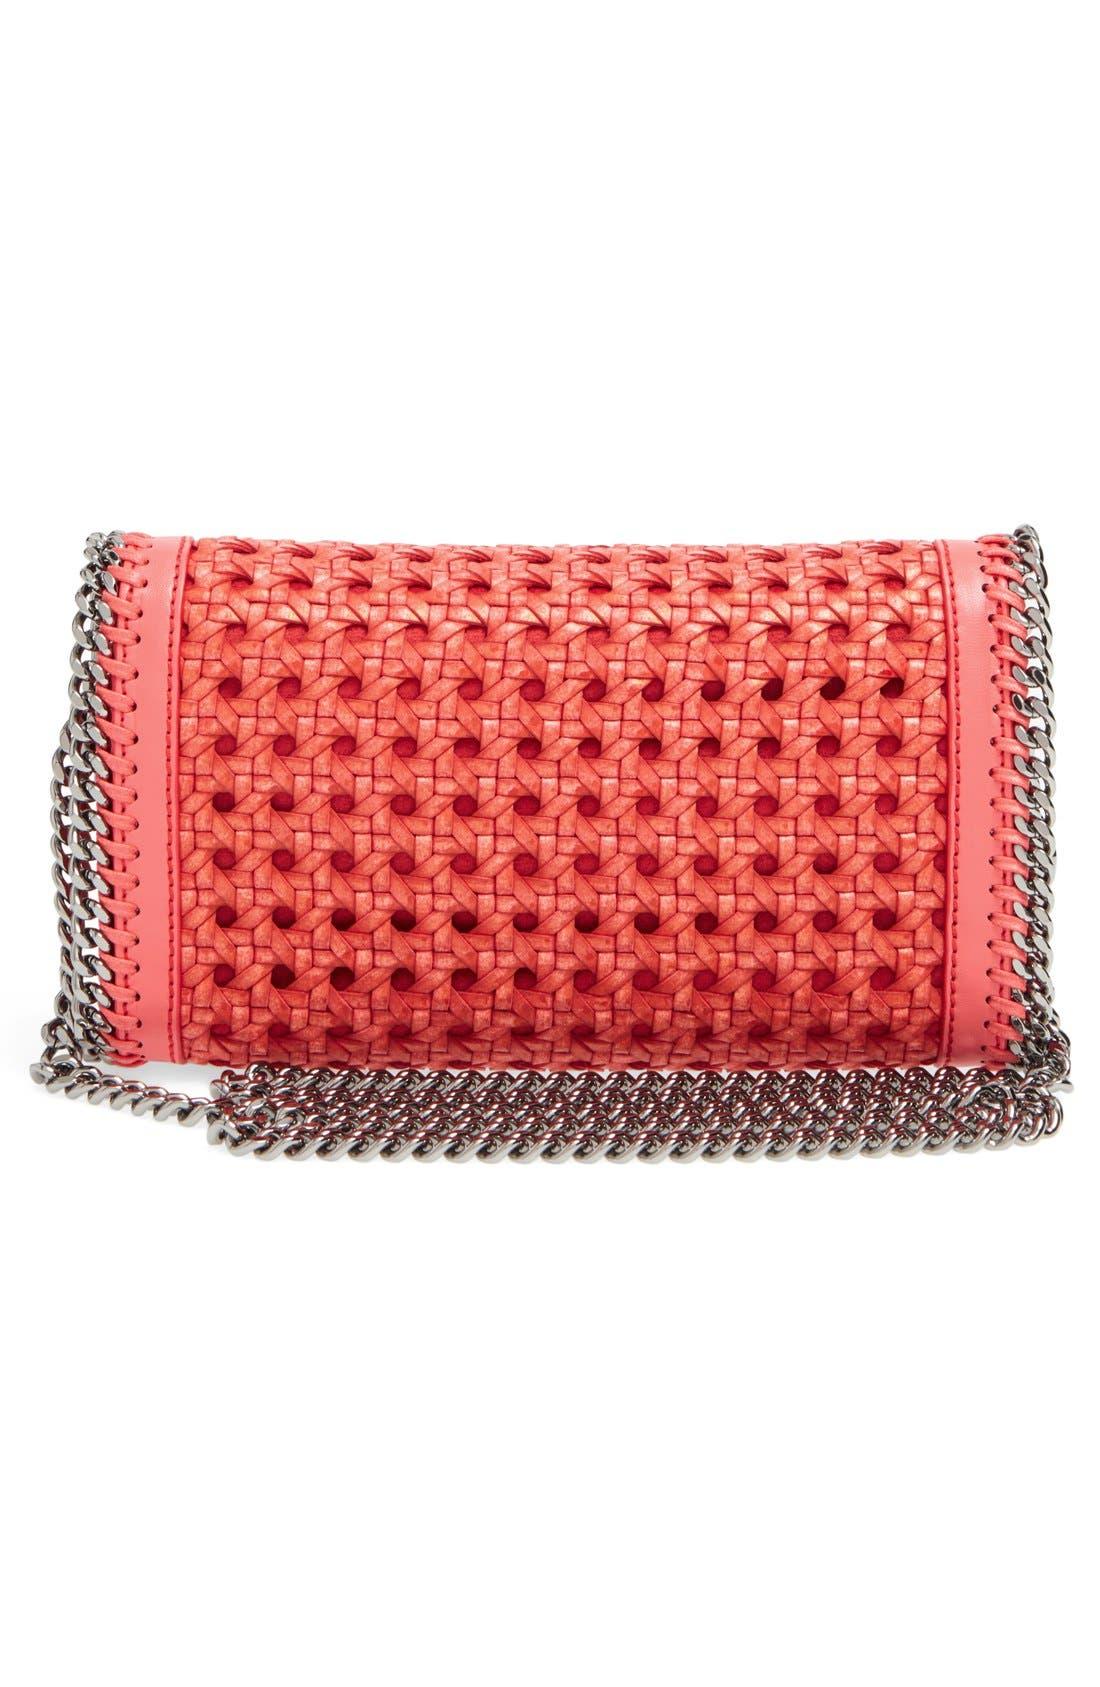 Alternate Image 3  - Stella McCartney 'Falabella - Caned' Faux Leather Crossbody Bag